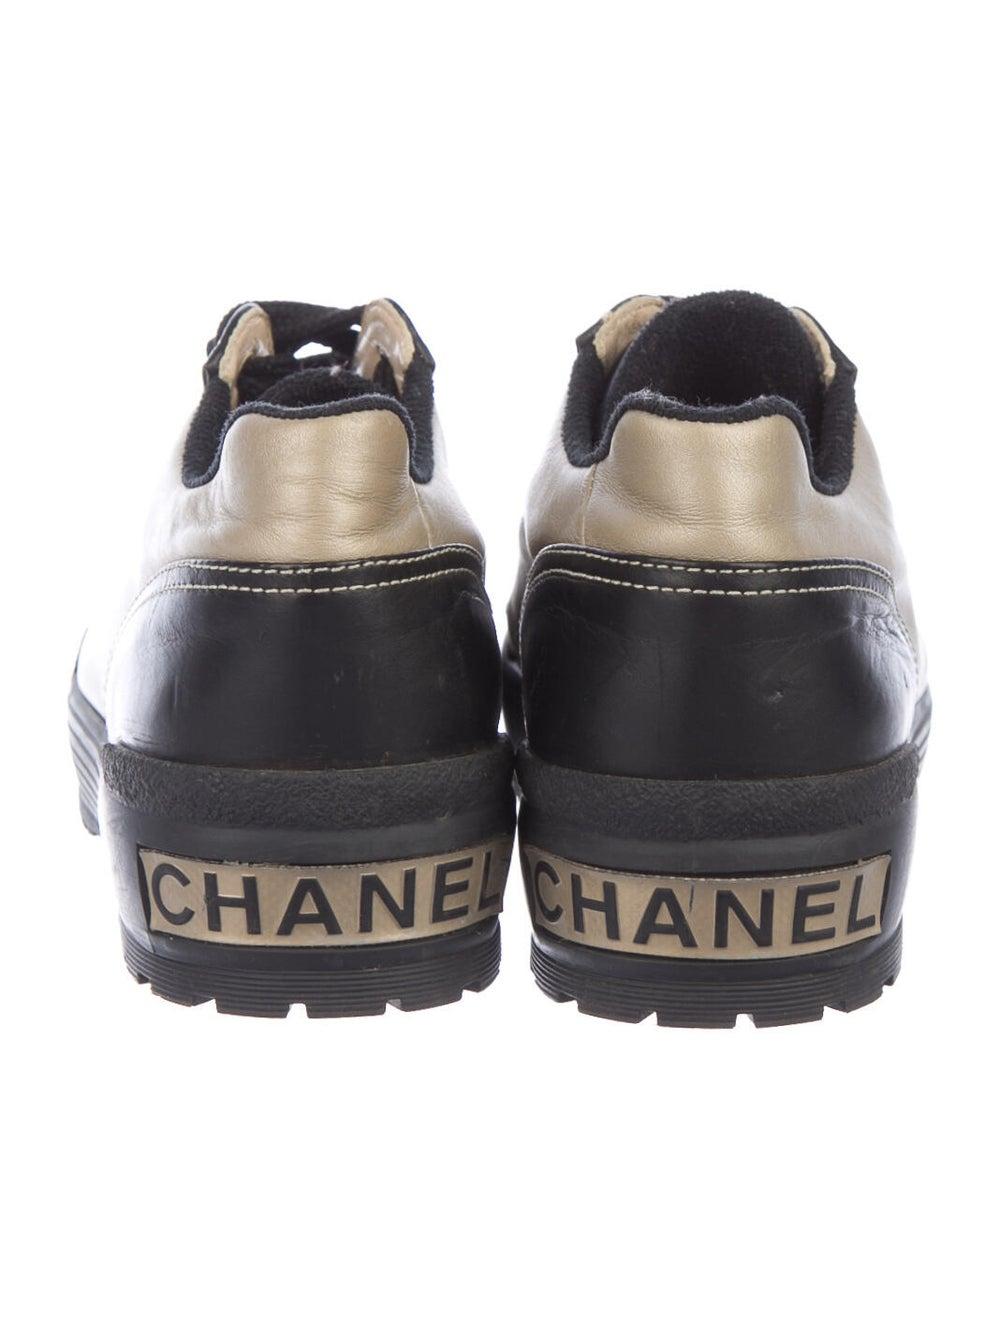 Chanel Interlocking CC Logo Leather Sneakers - image 4